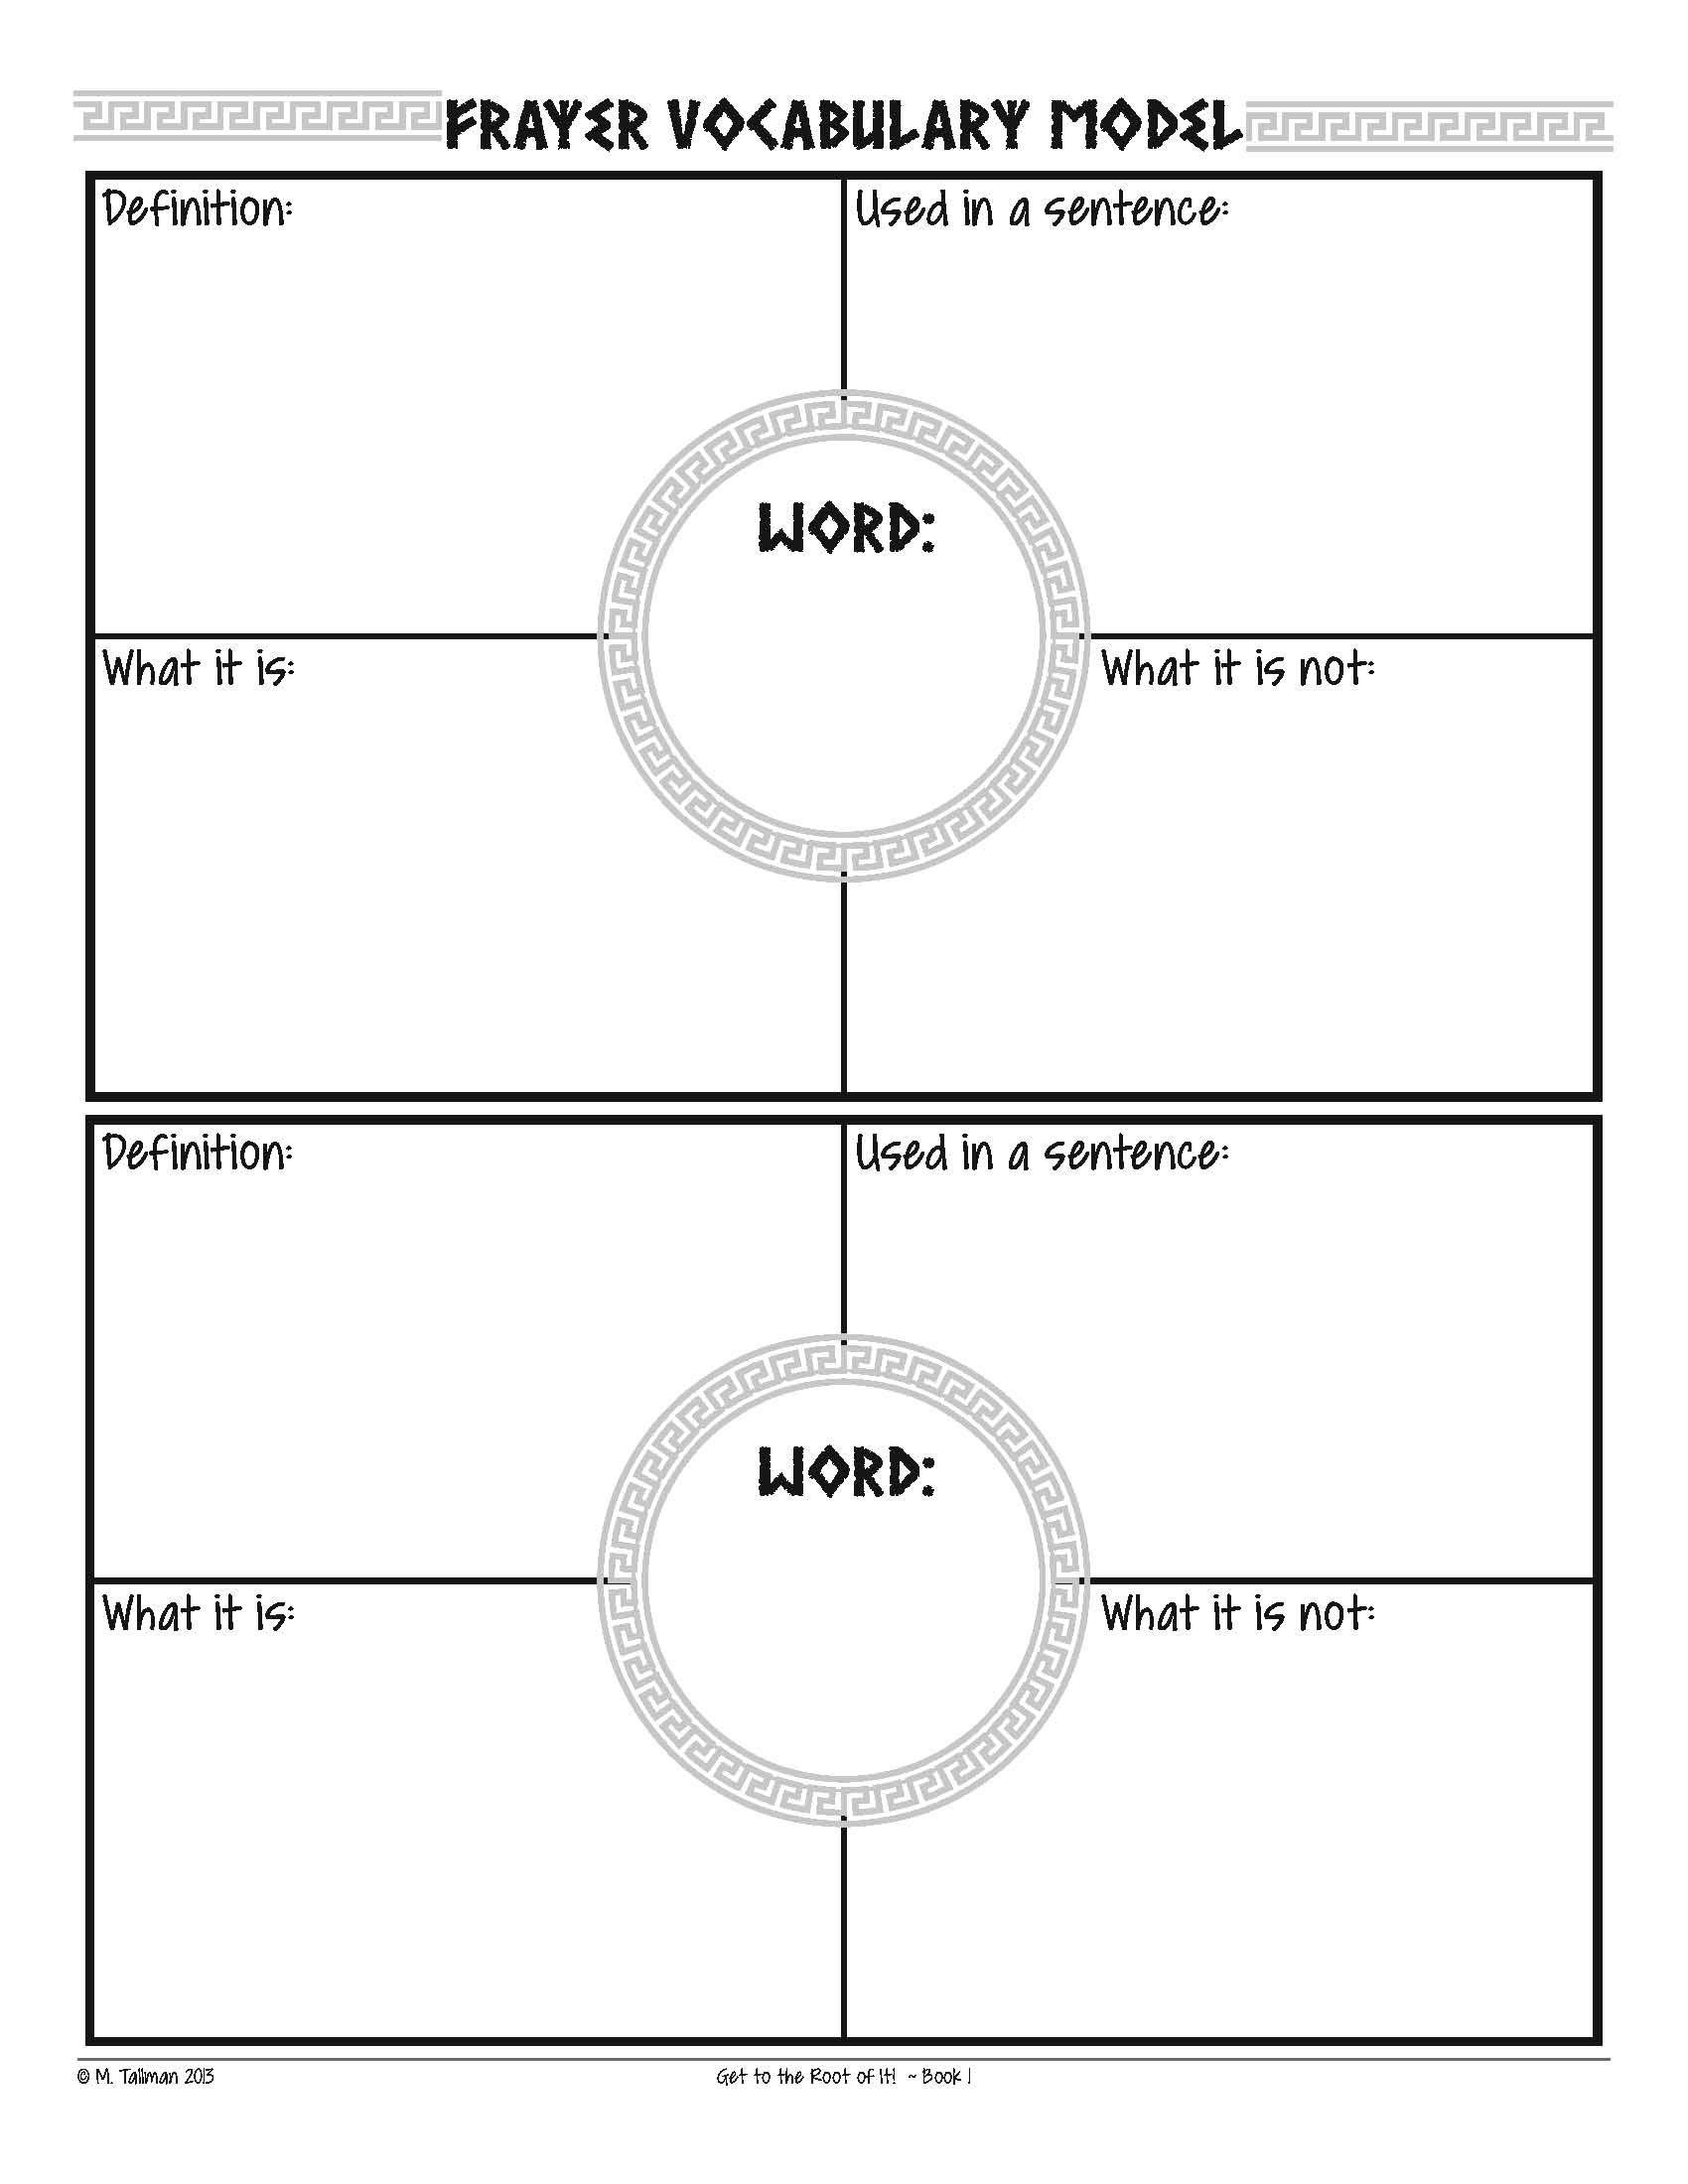 Free Frayer Model Vocabulary Graphic Organizers